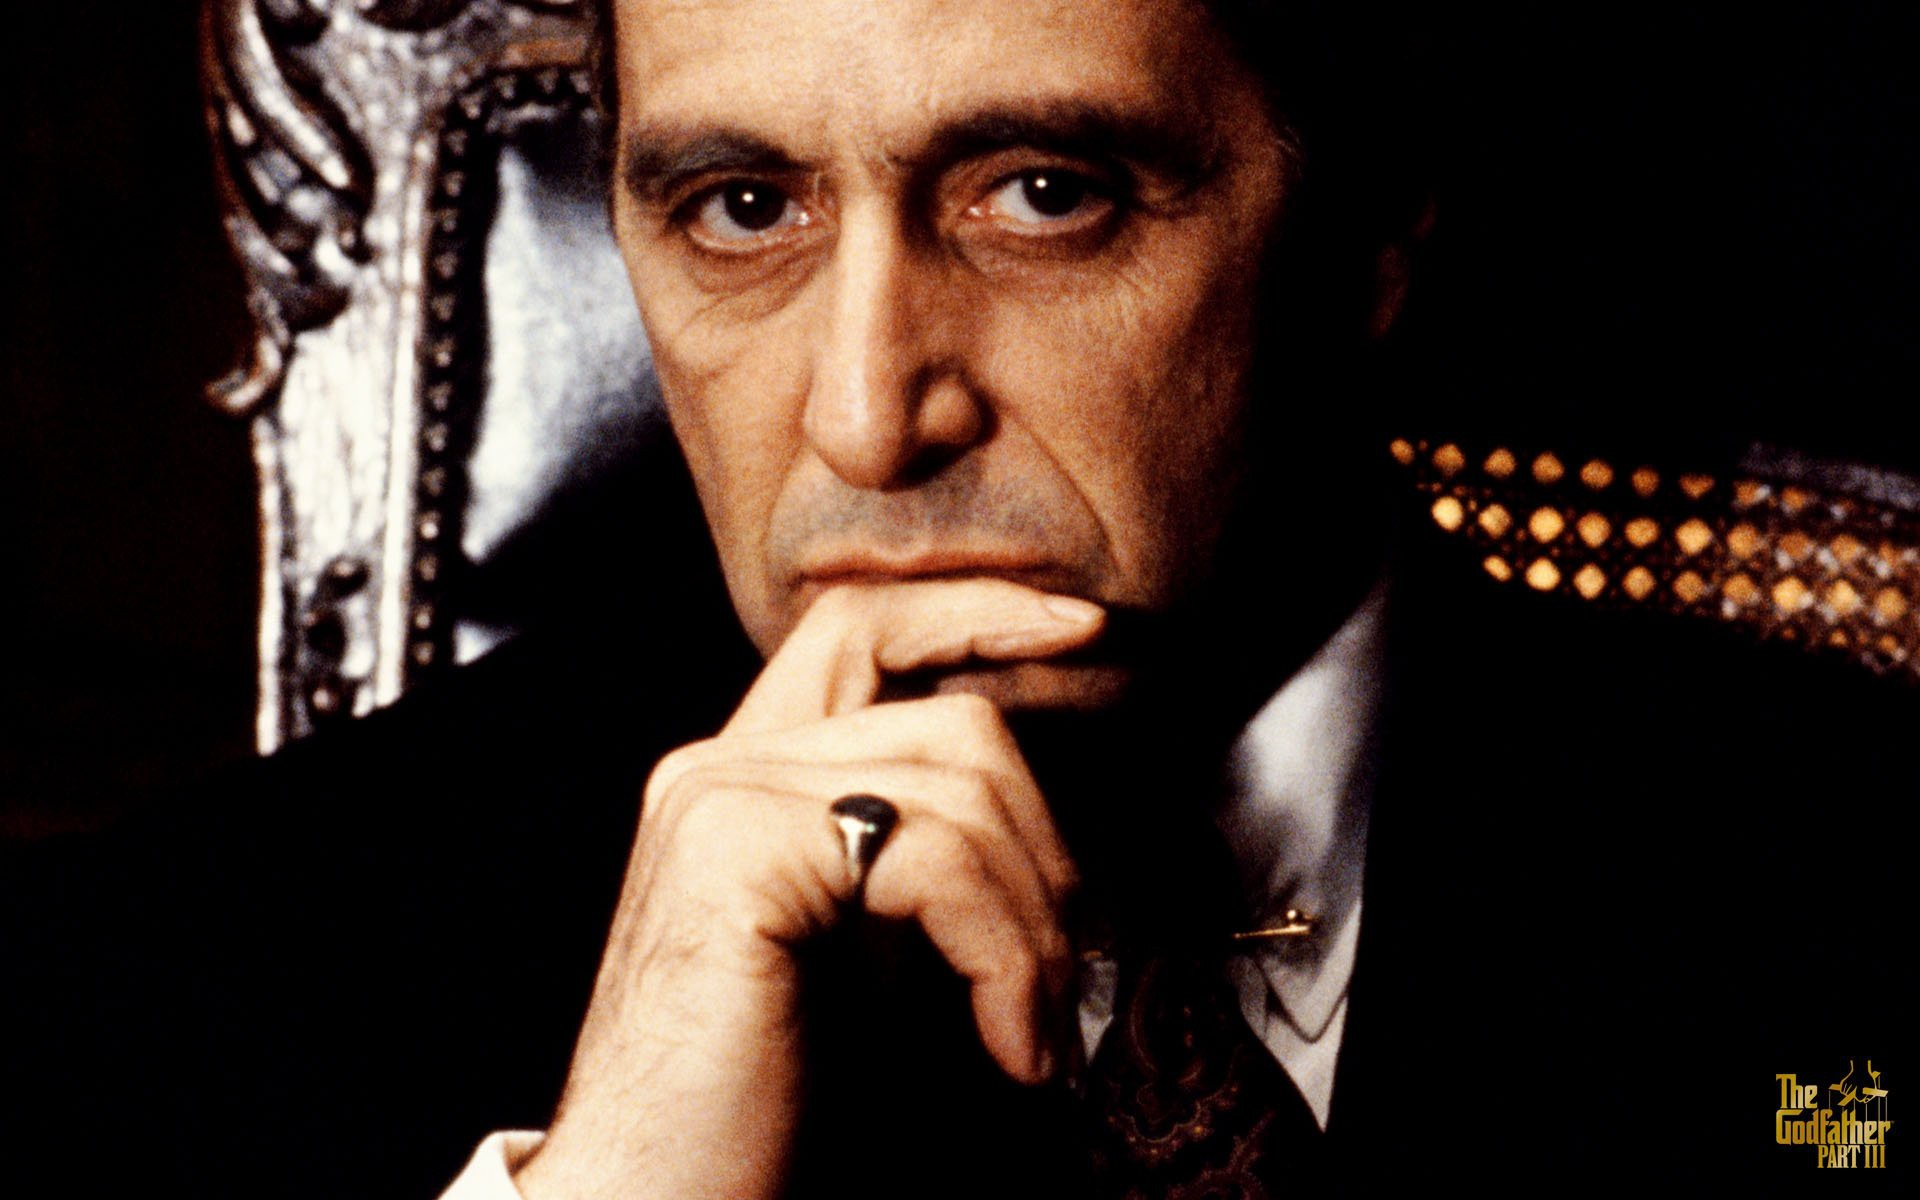 Movies The Godfather Monochrome Al Pacino Wallpaper - Godfather 3 - HD Wallpaper